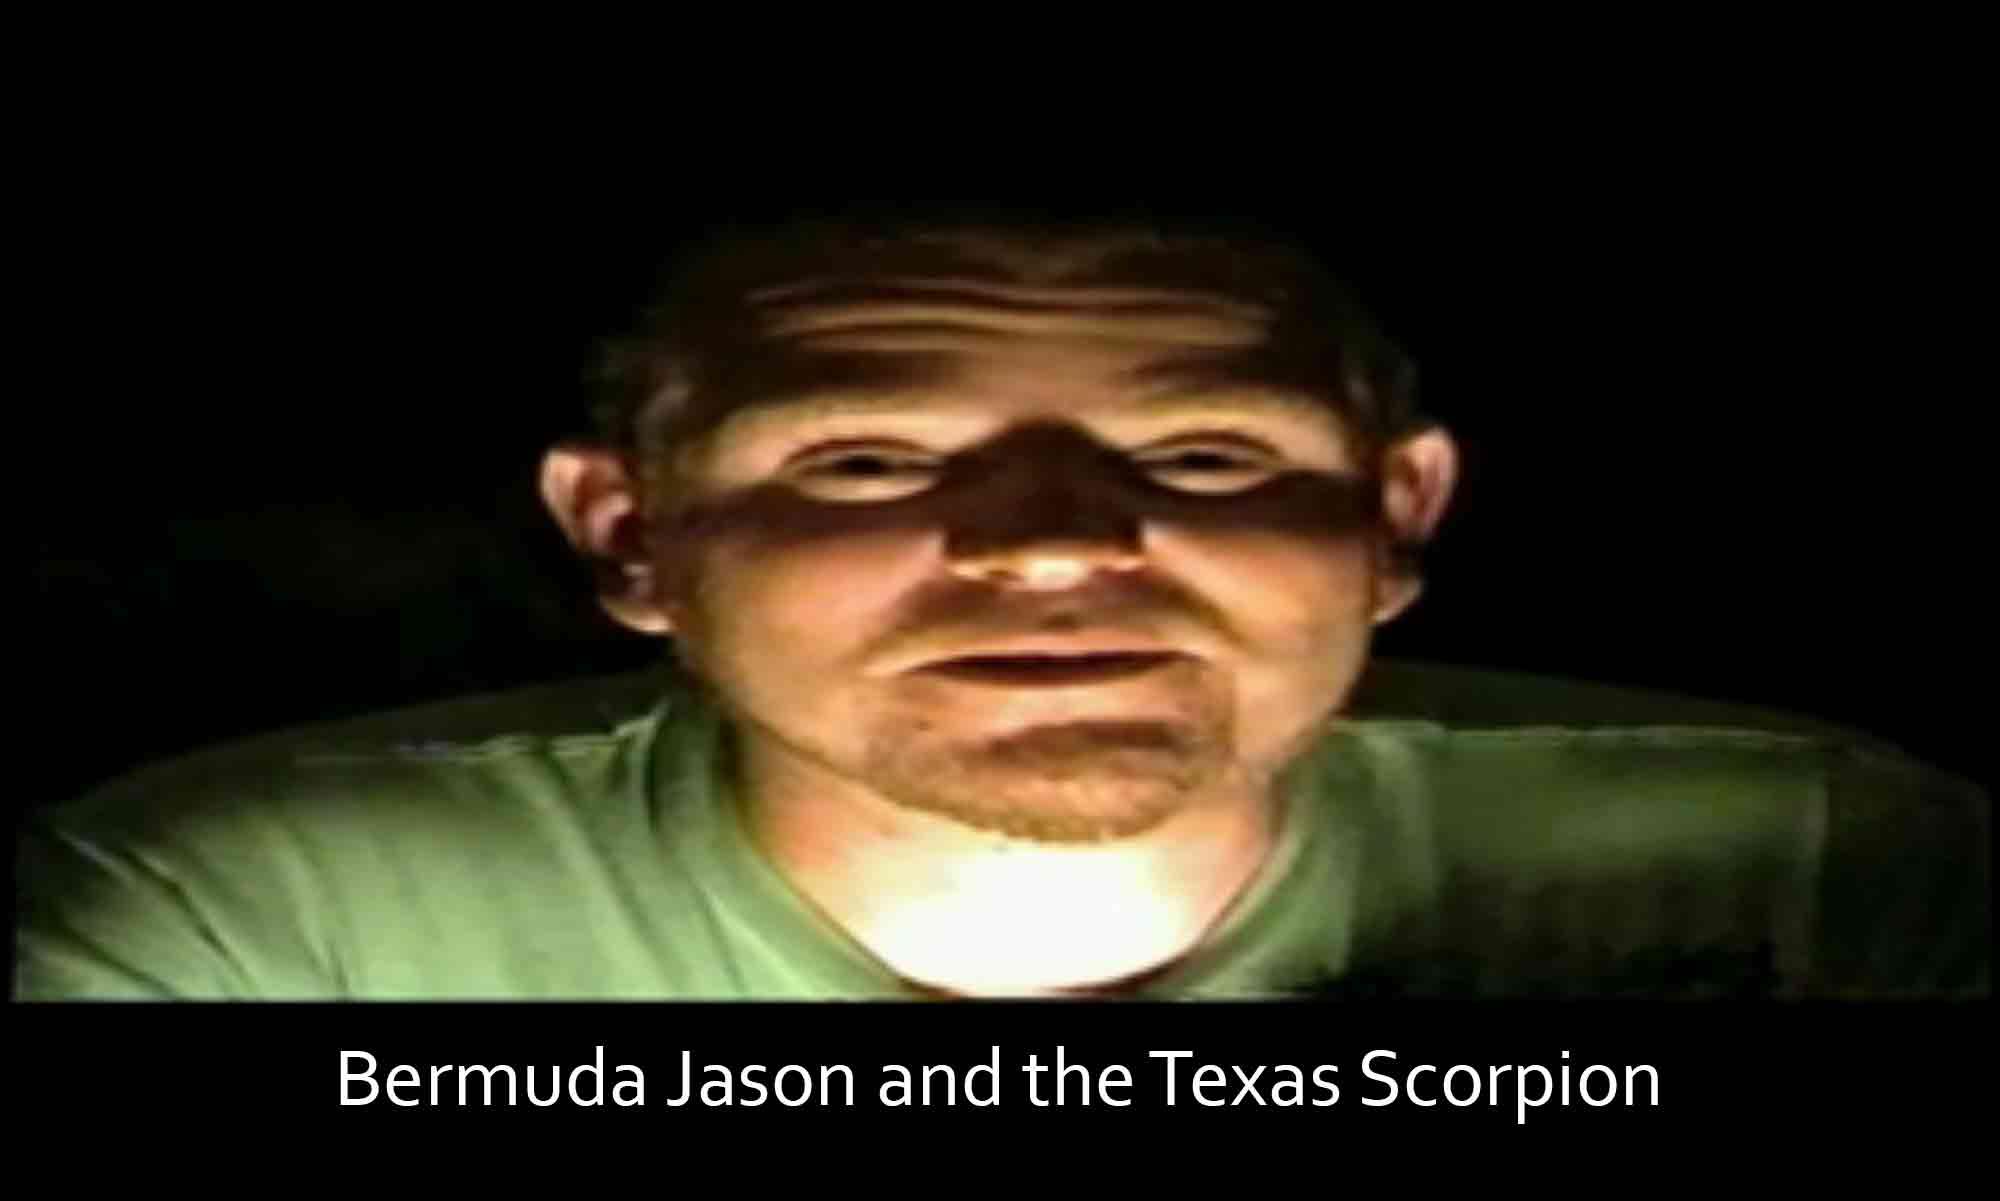 Image of Bermuda Jason and the Texas Scorpion Brayton Scott Entertainment©